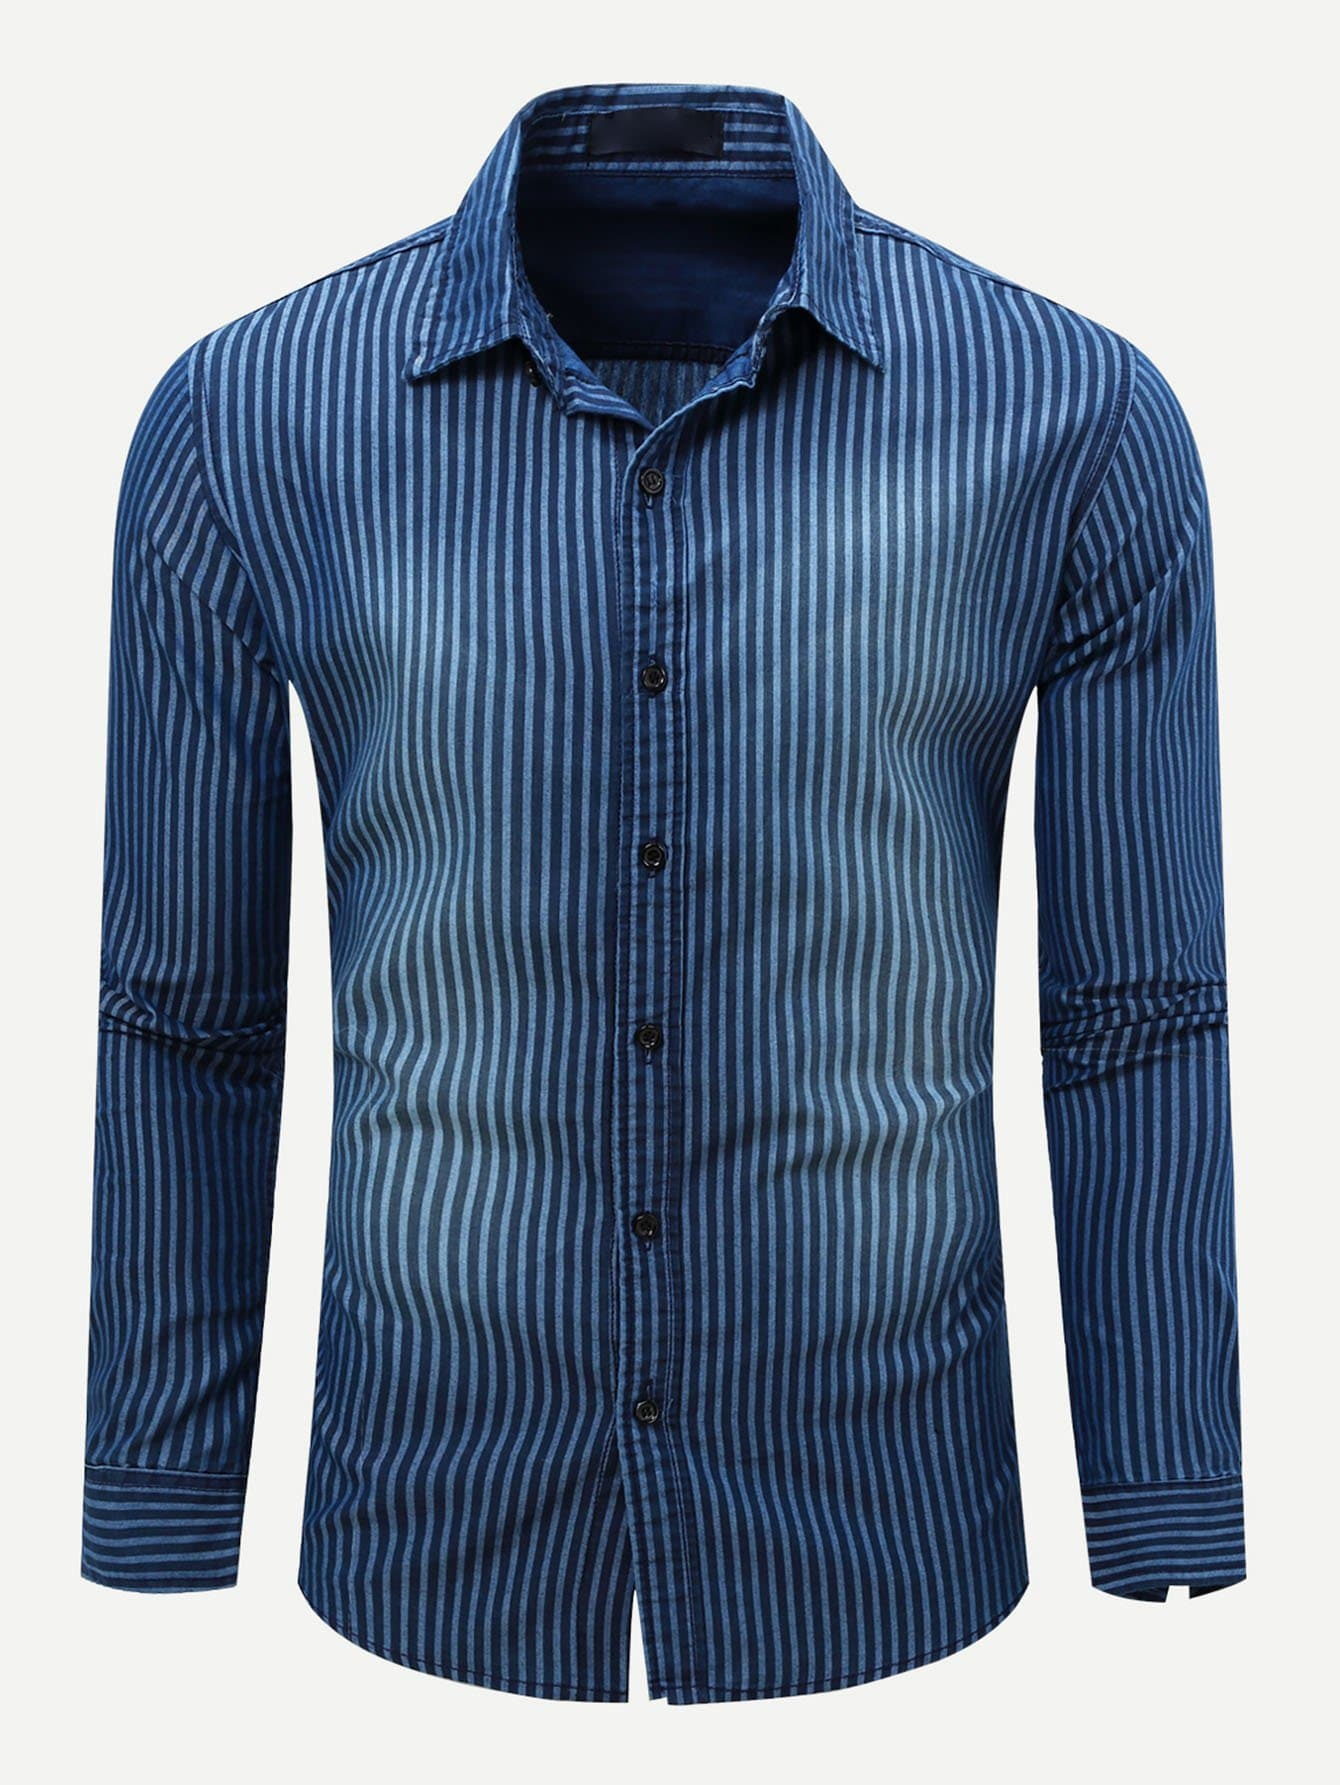 Men Striped Collar Denim Shirt Men Striped Collar Denim Shirt